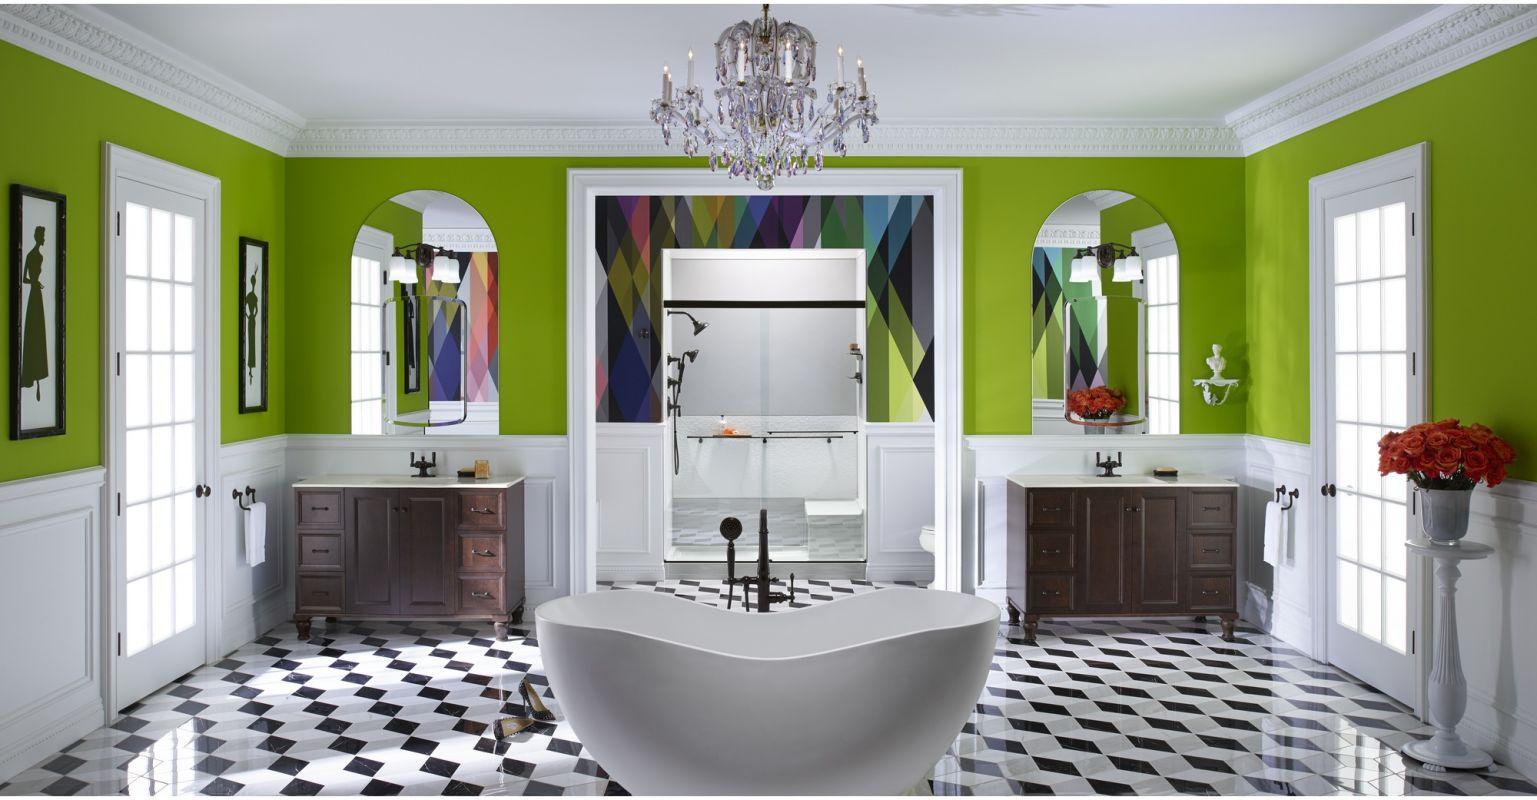 Comfortable Kohler Sink Faucet Contemporary - Bathtub Design Ideas ...